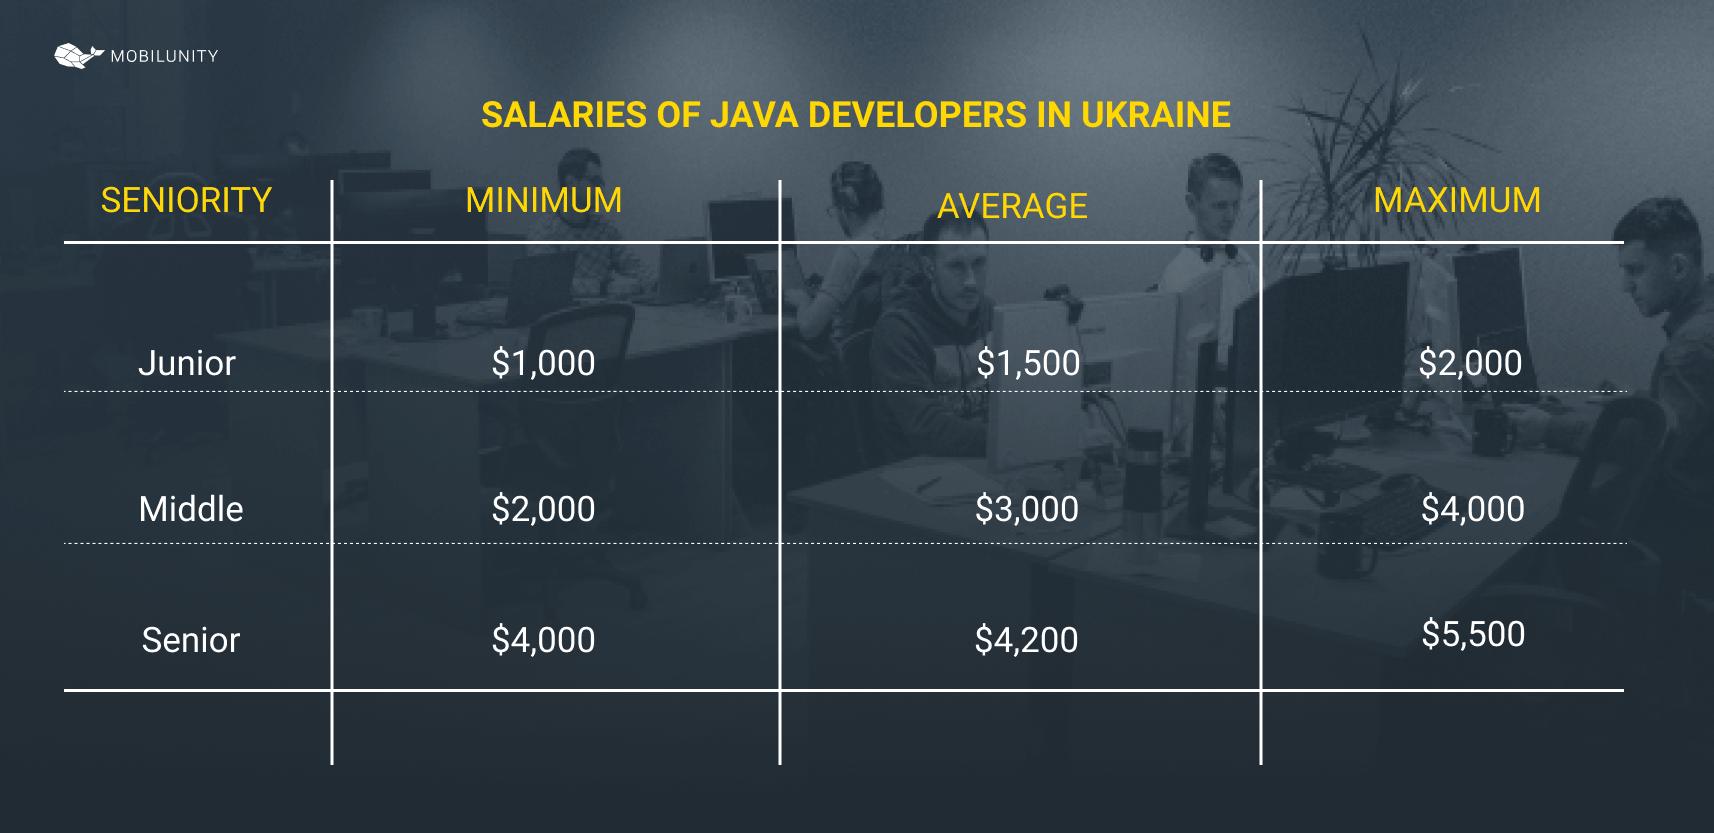 Java developer salary in Ukraine